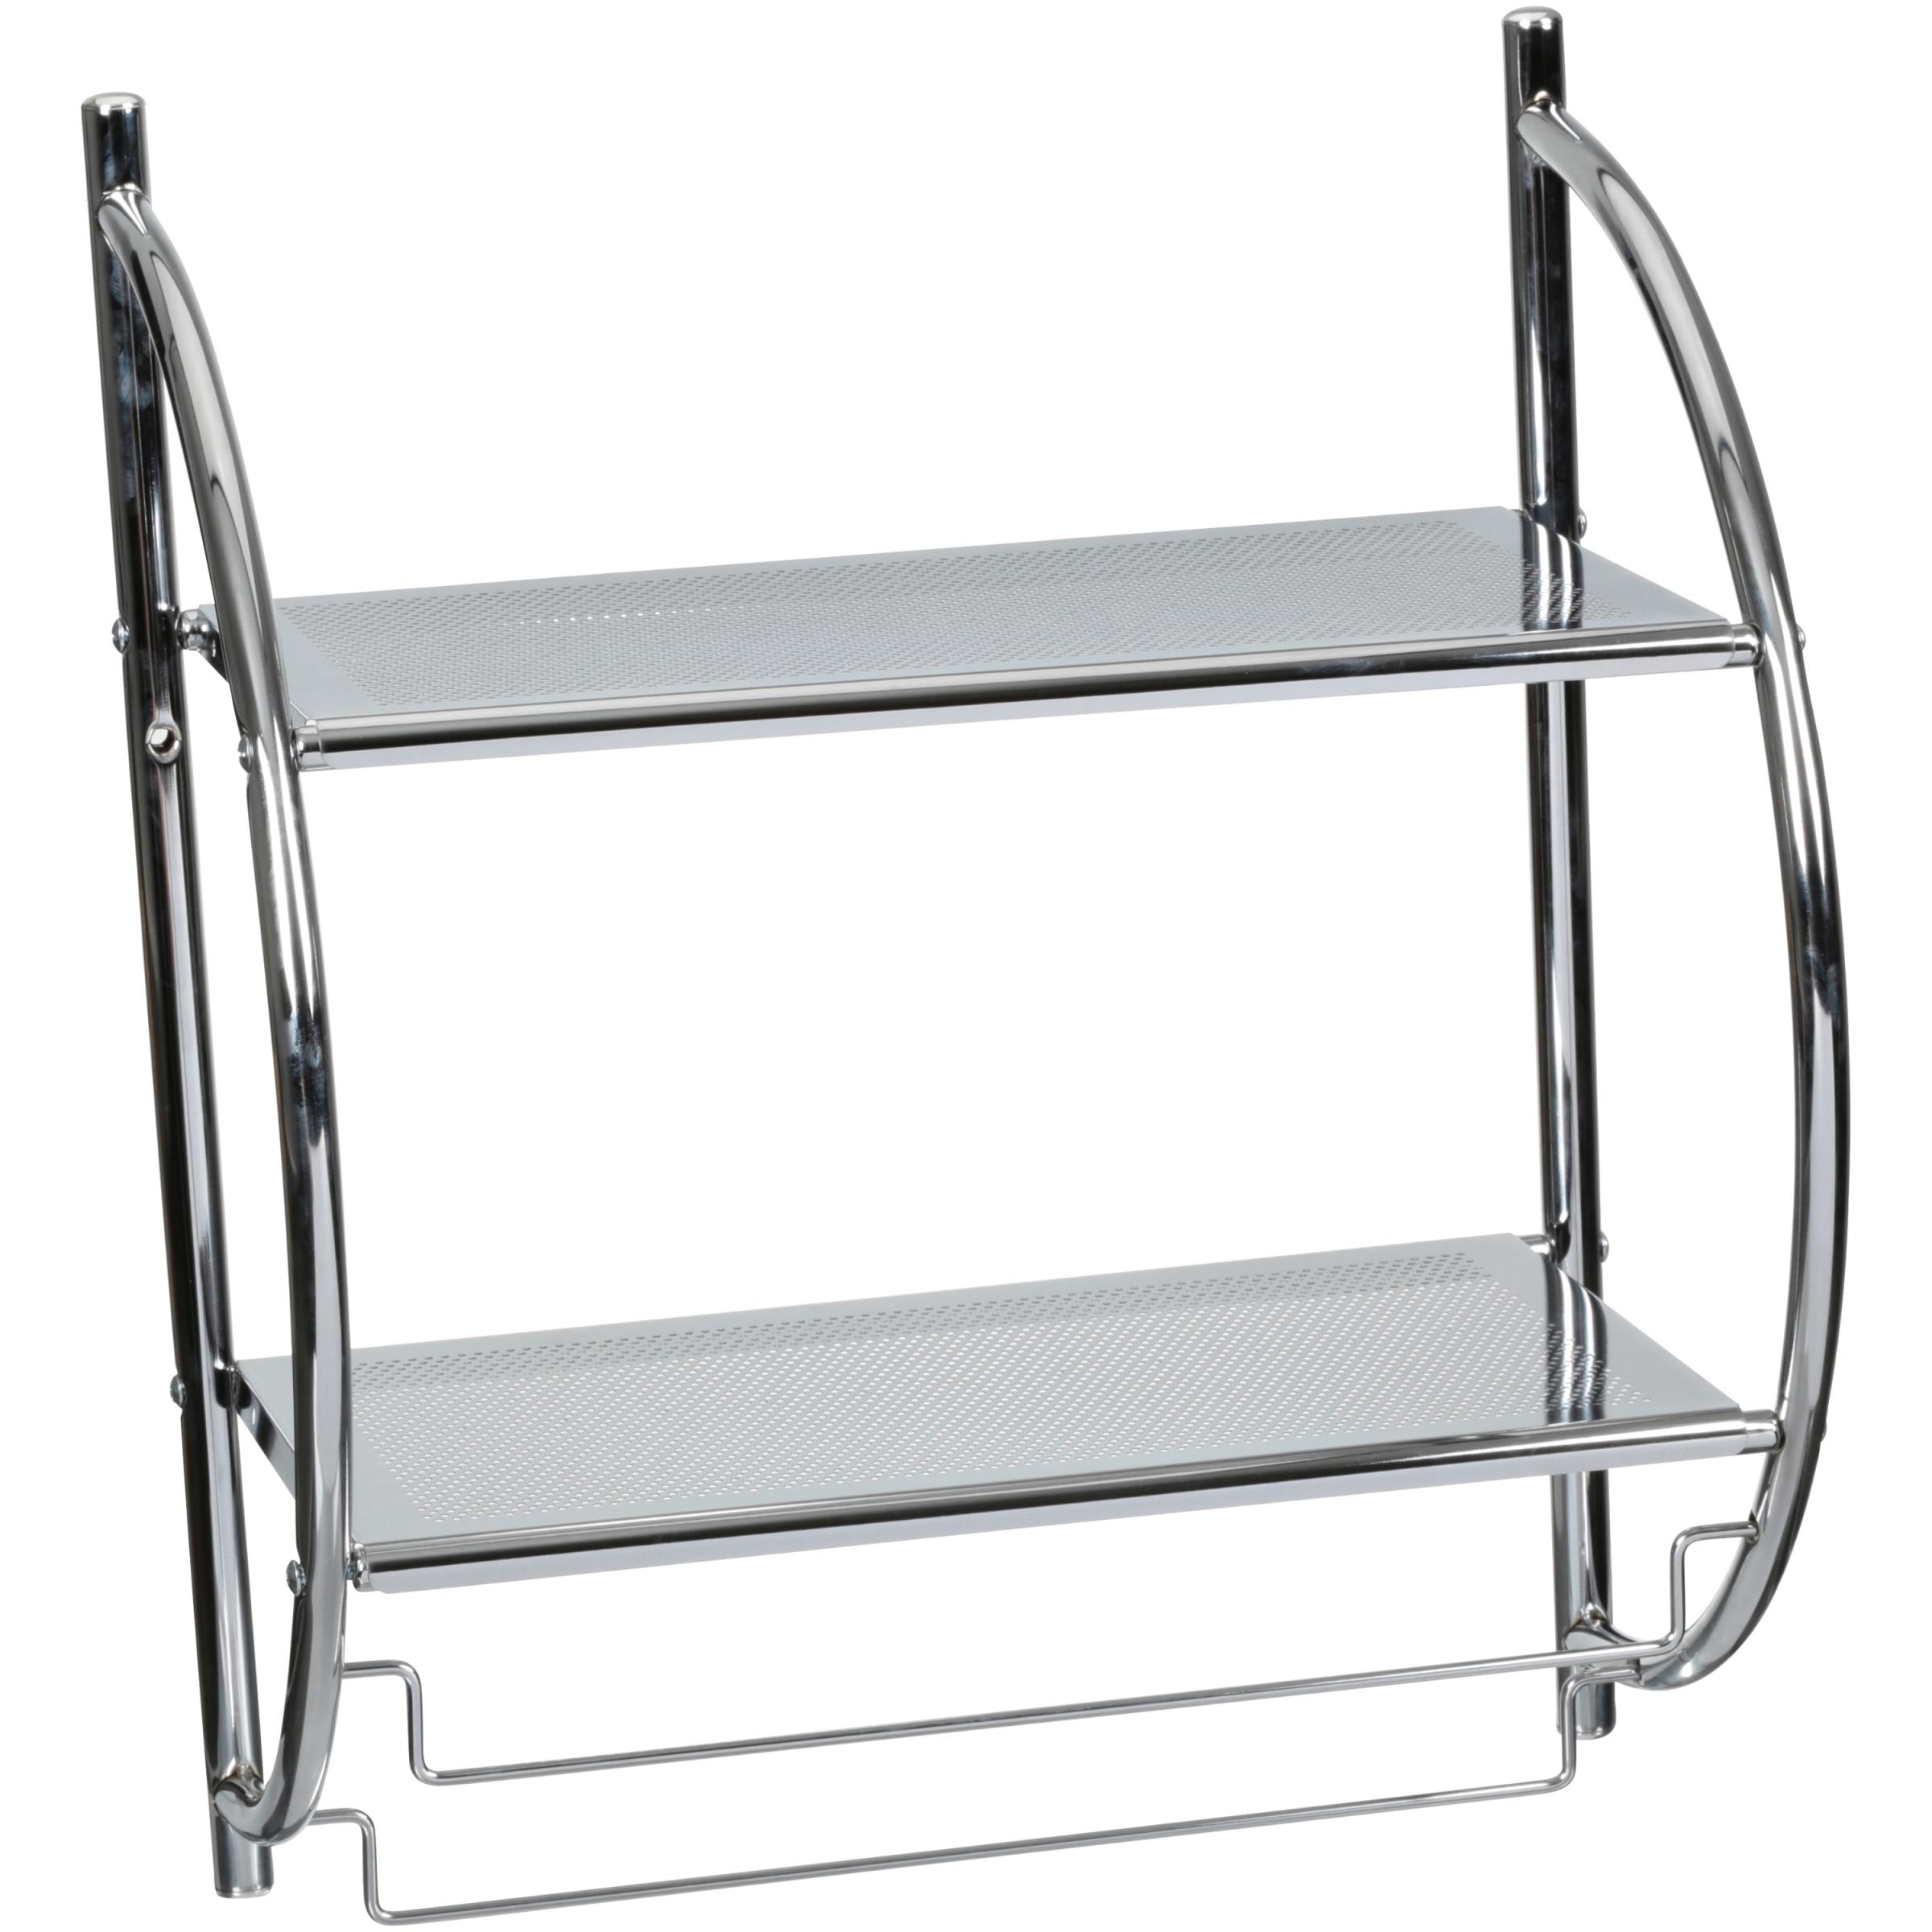 Neu Home® 2 Tier Mounting Shelf with Towel Bars $14.99